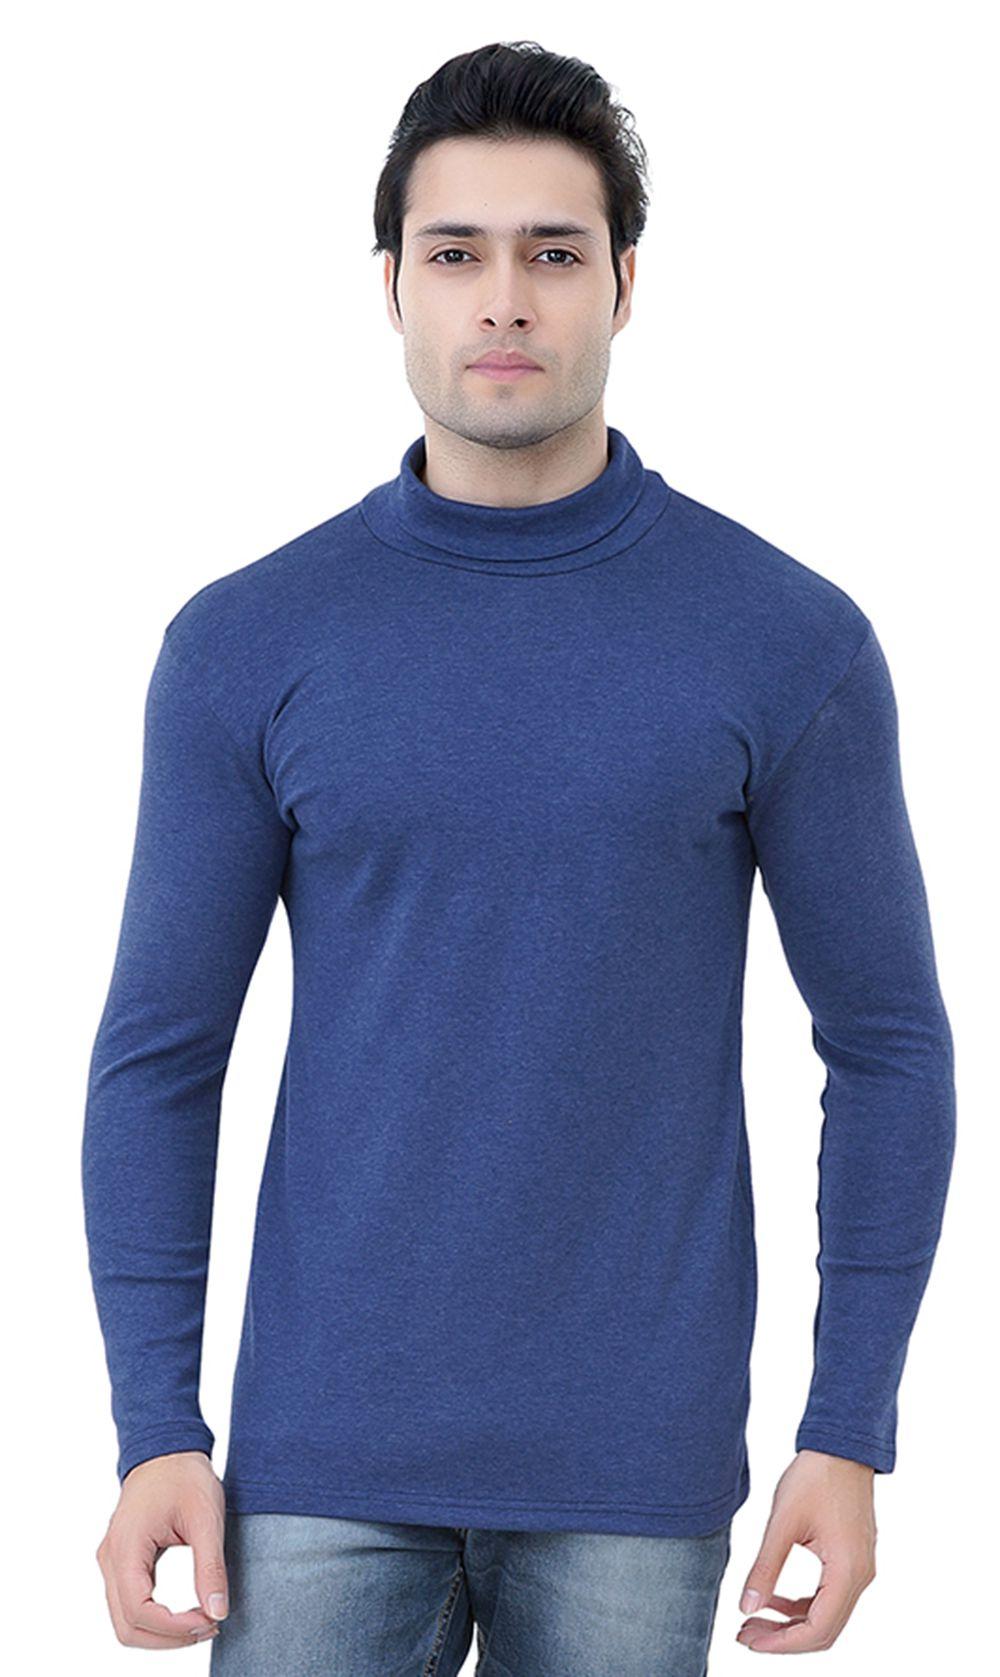 RoyalShoppingCart Blue Round T-Shirt